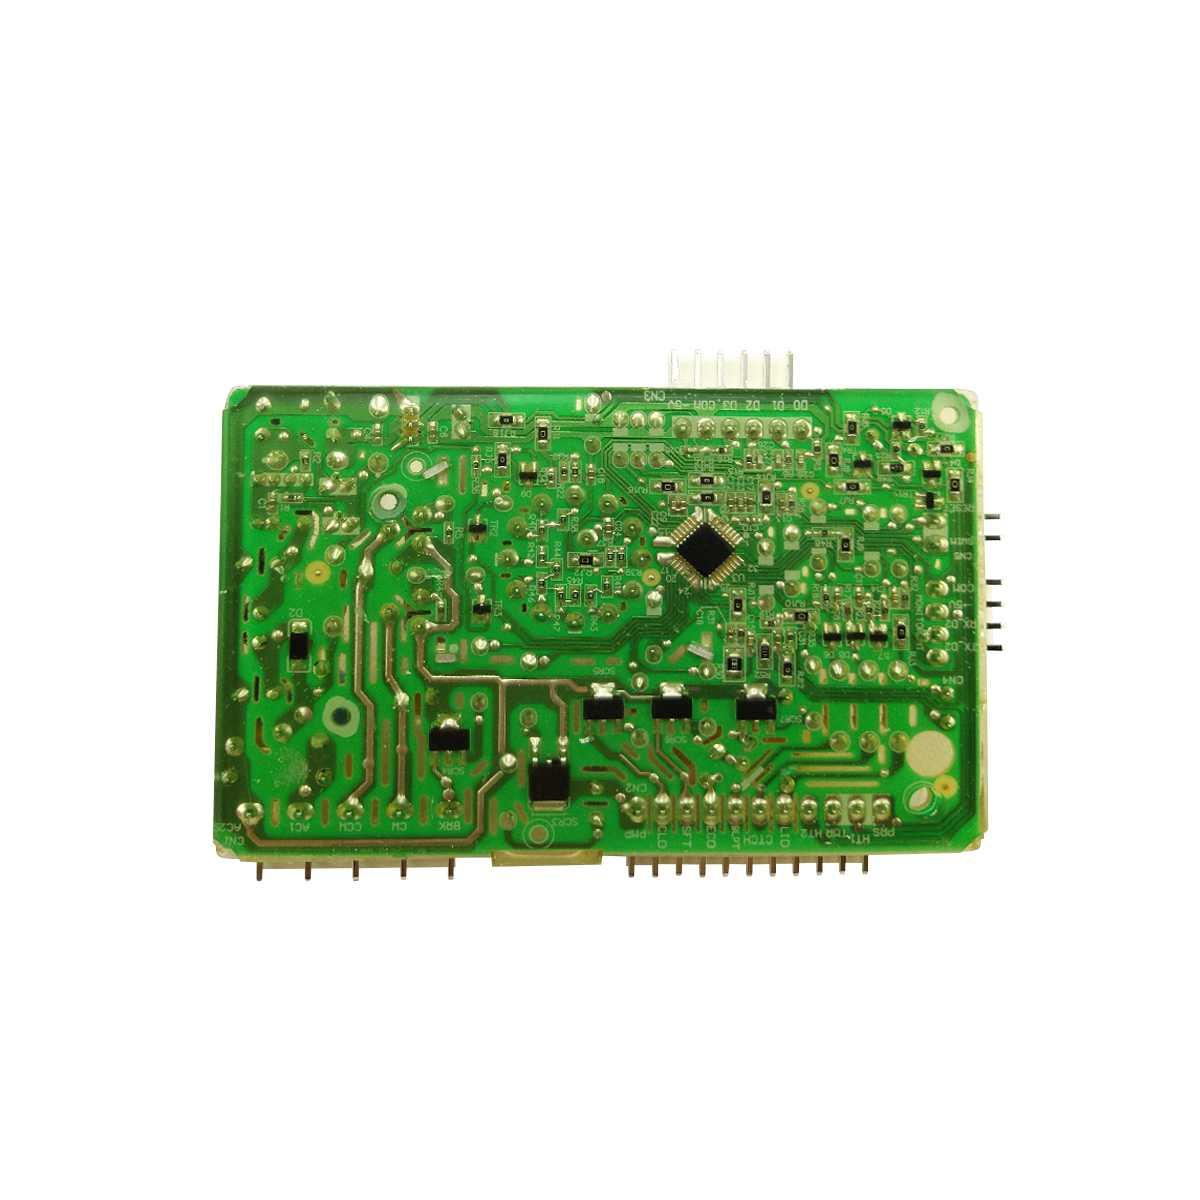 Placa potencia lavadora electrolux LTD09 70202657